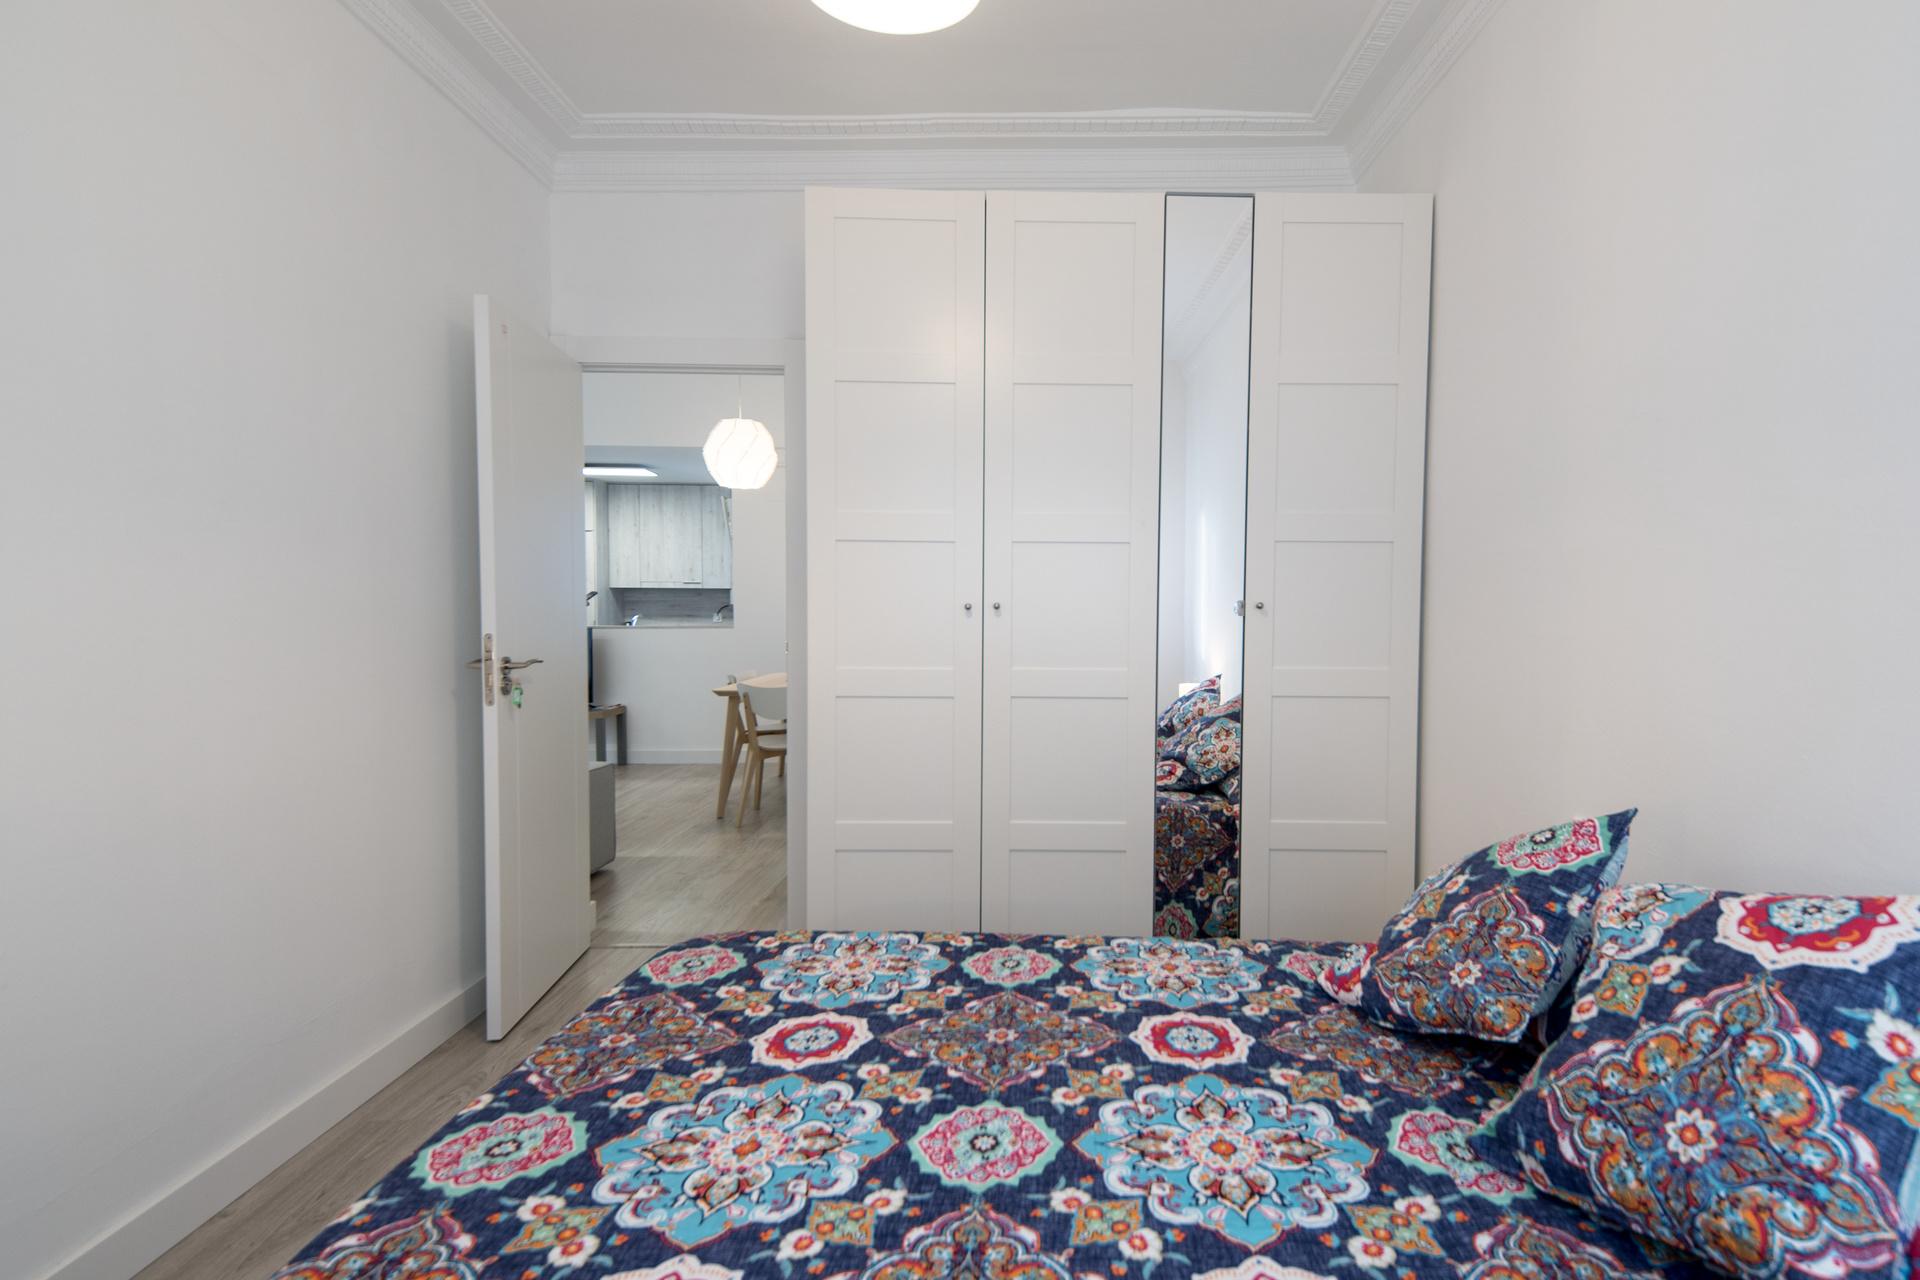 habitacion alquilar piso zaragoza poppy rooms